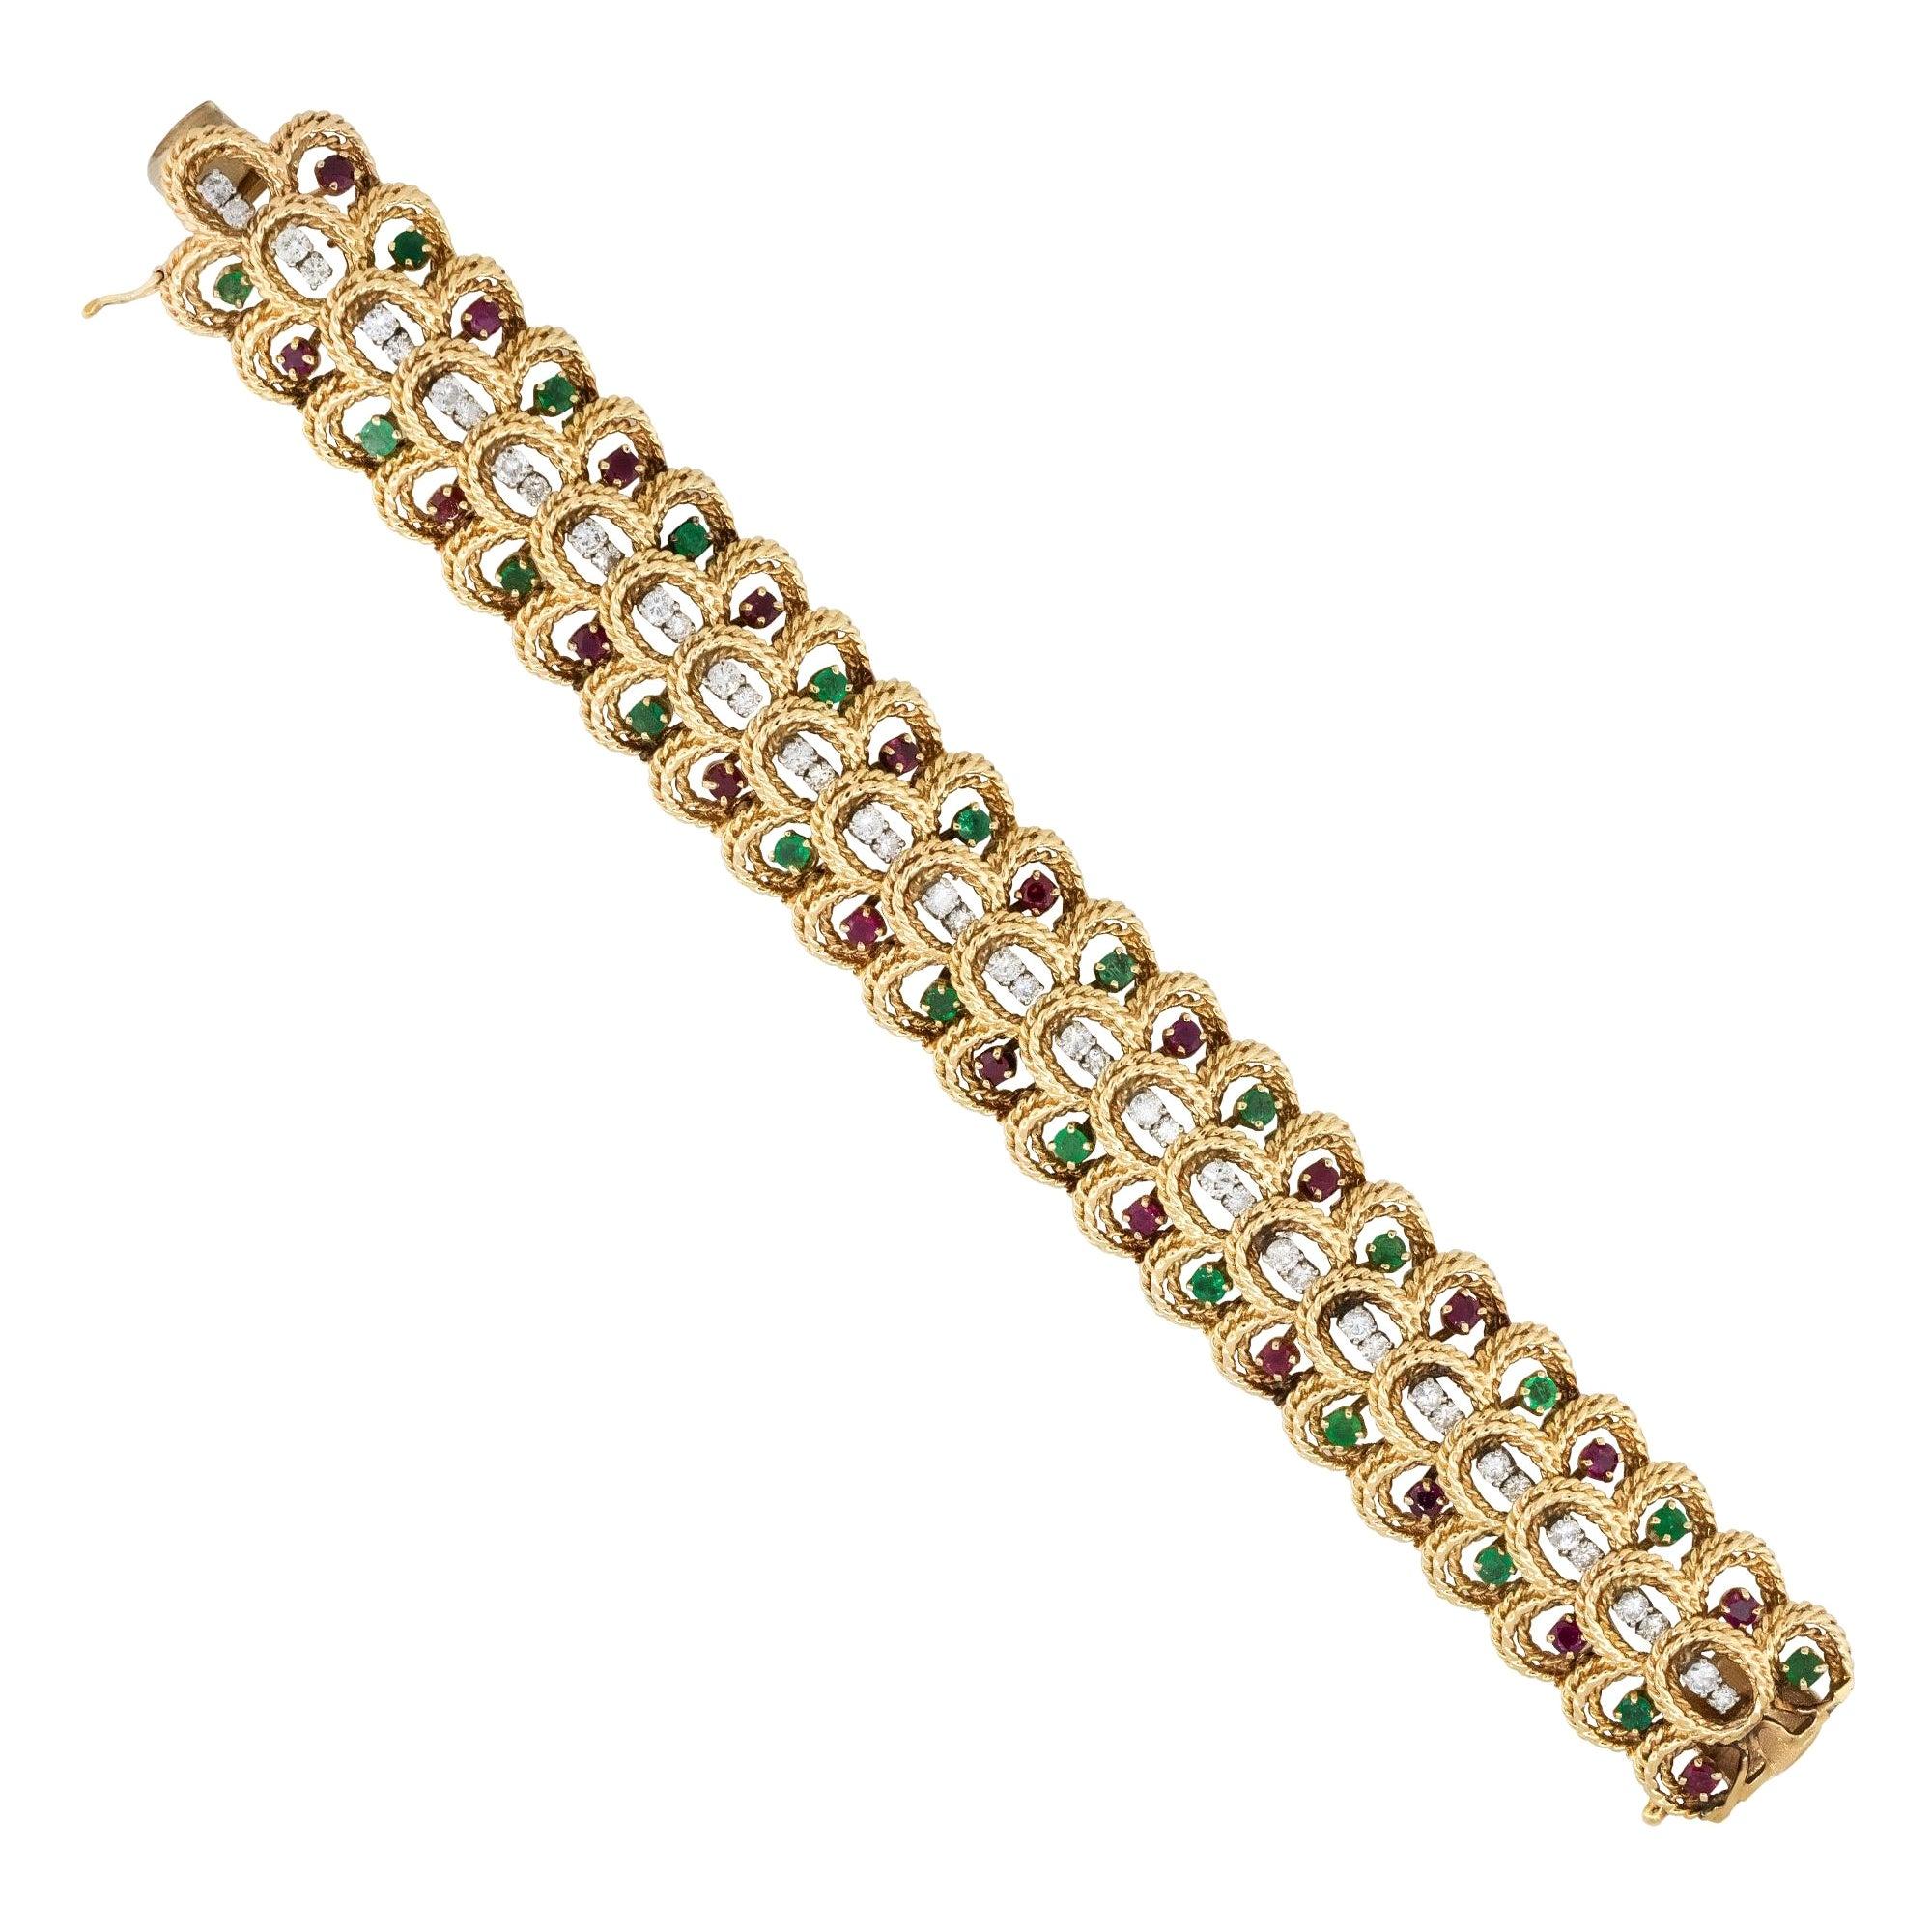 Multi Stone Vintage Rope Link Bracelet 14 Karat in Stock